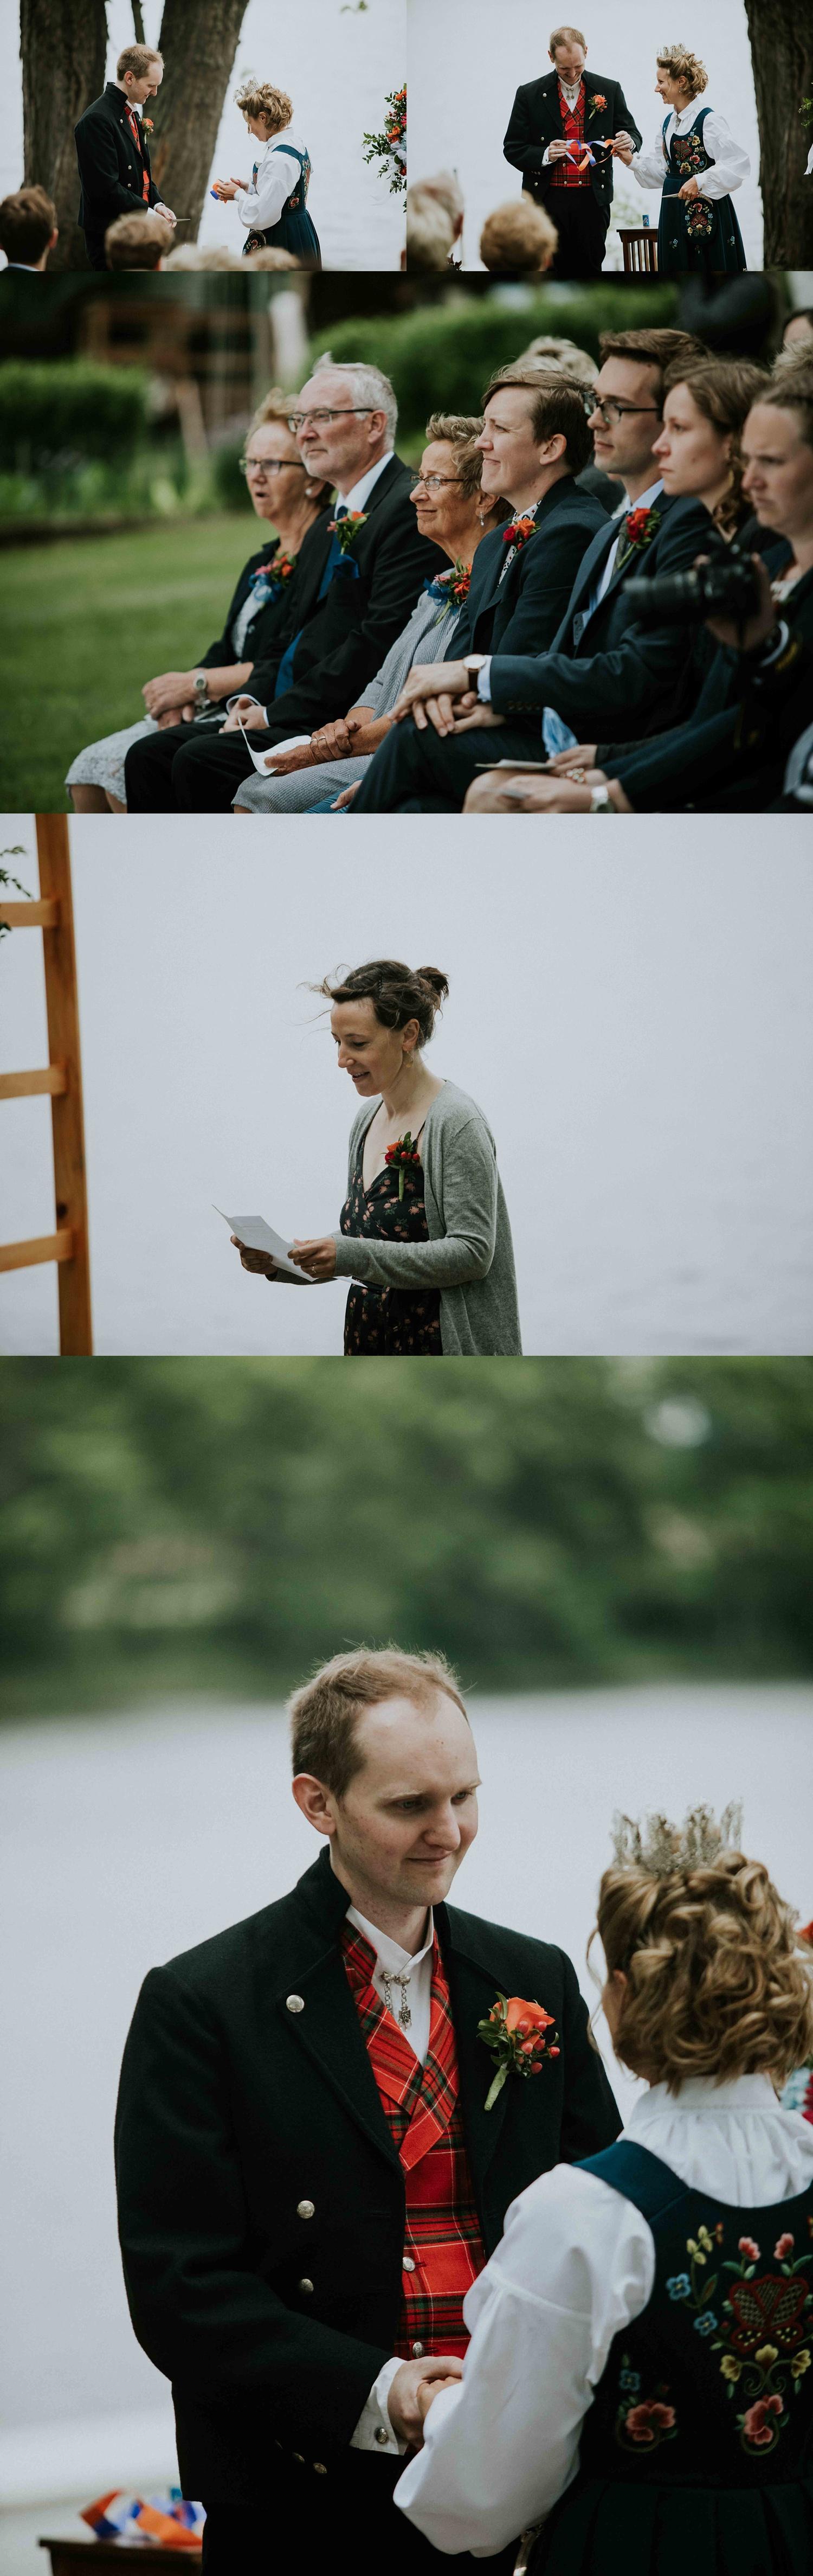 Norwegian Wedding Stevens Point Wisconsin Wedding Photographer Chloe Ann Photography_0014.jpg